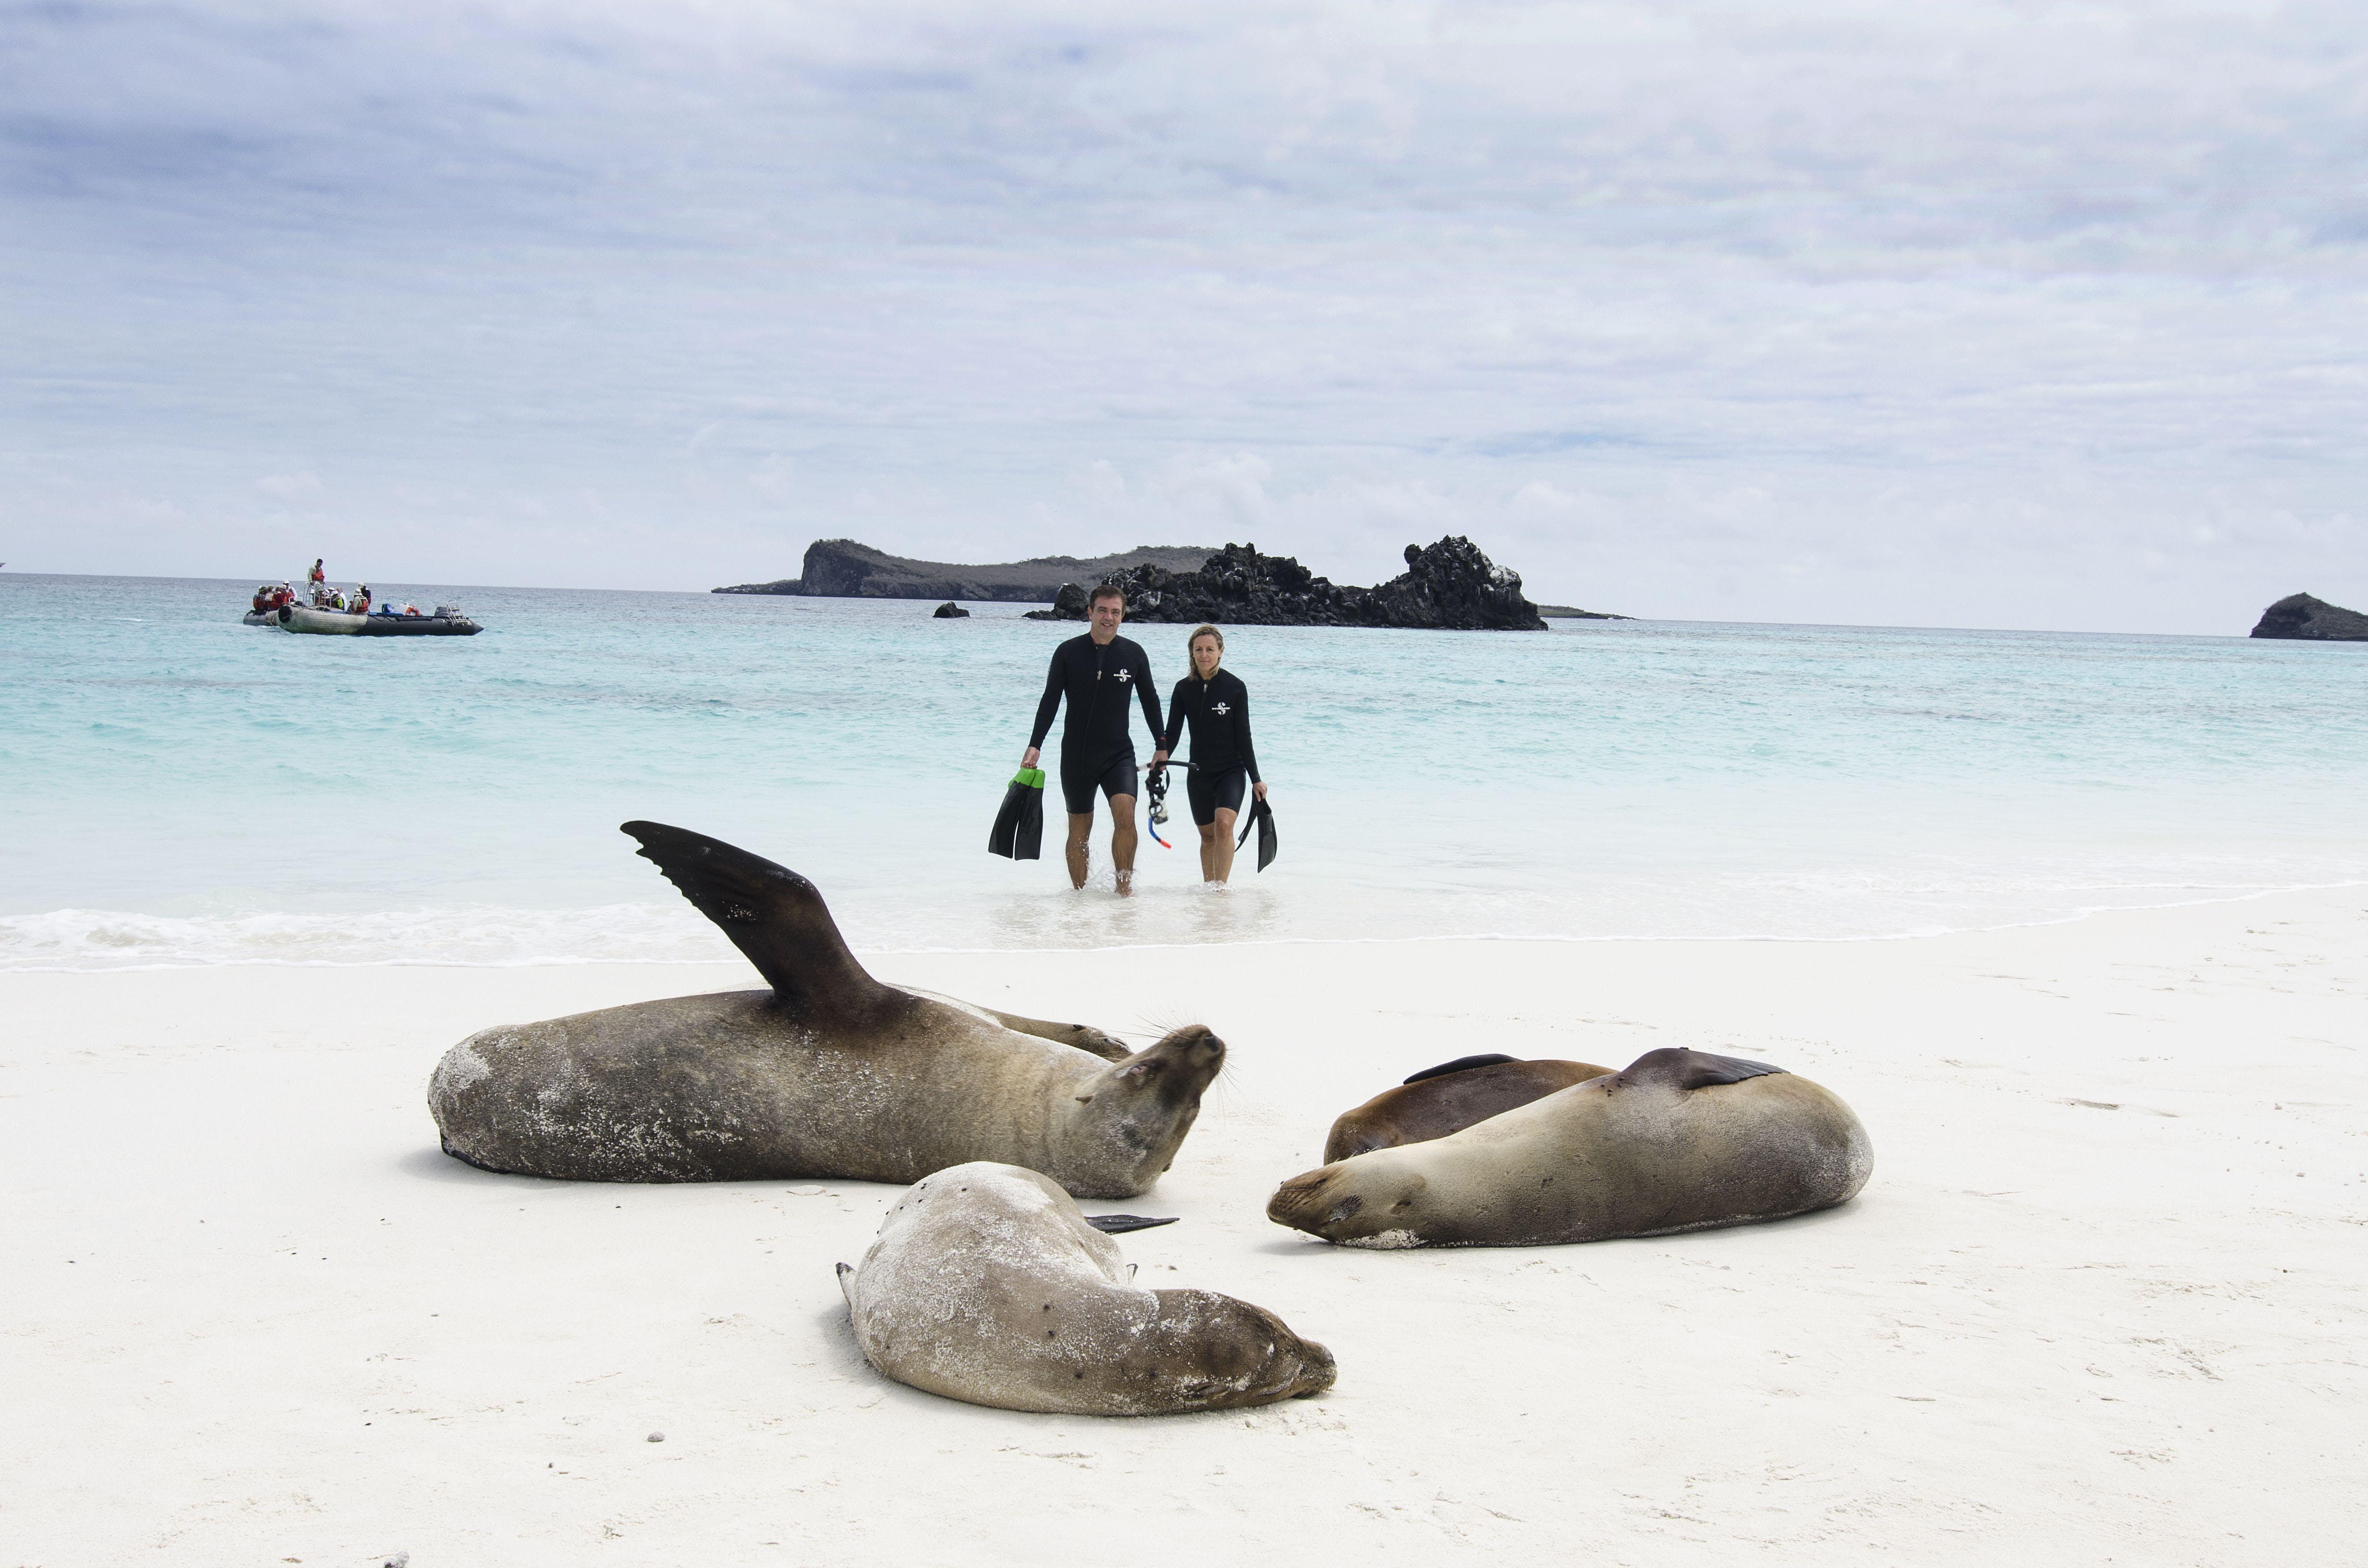 galapagos_snorkeling_sealions